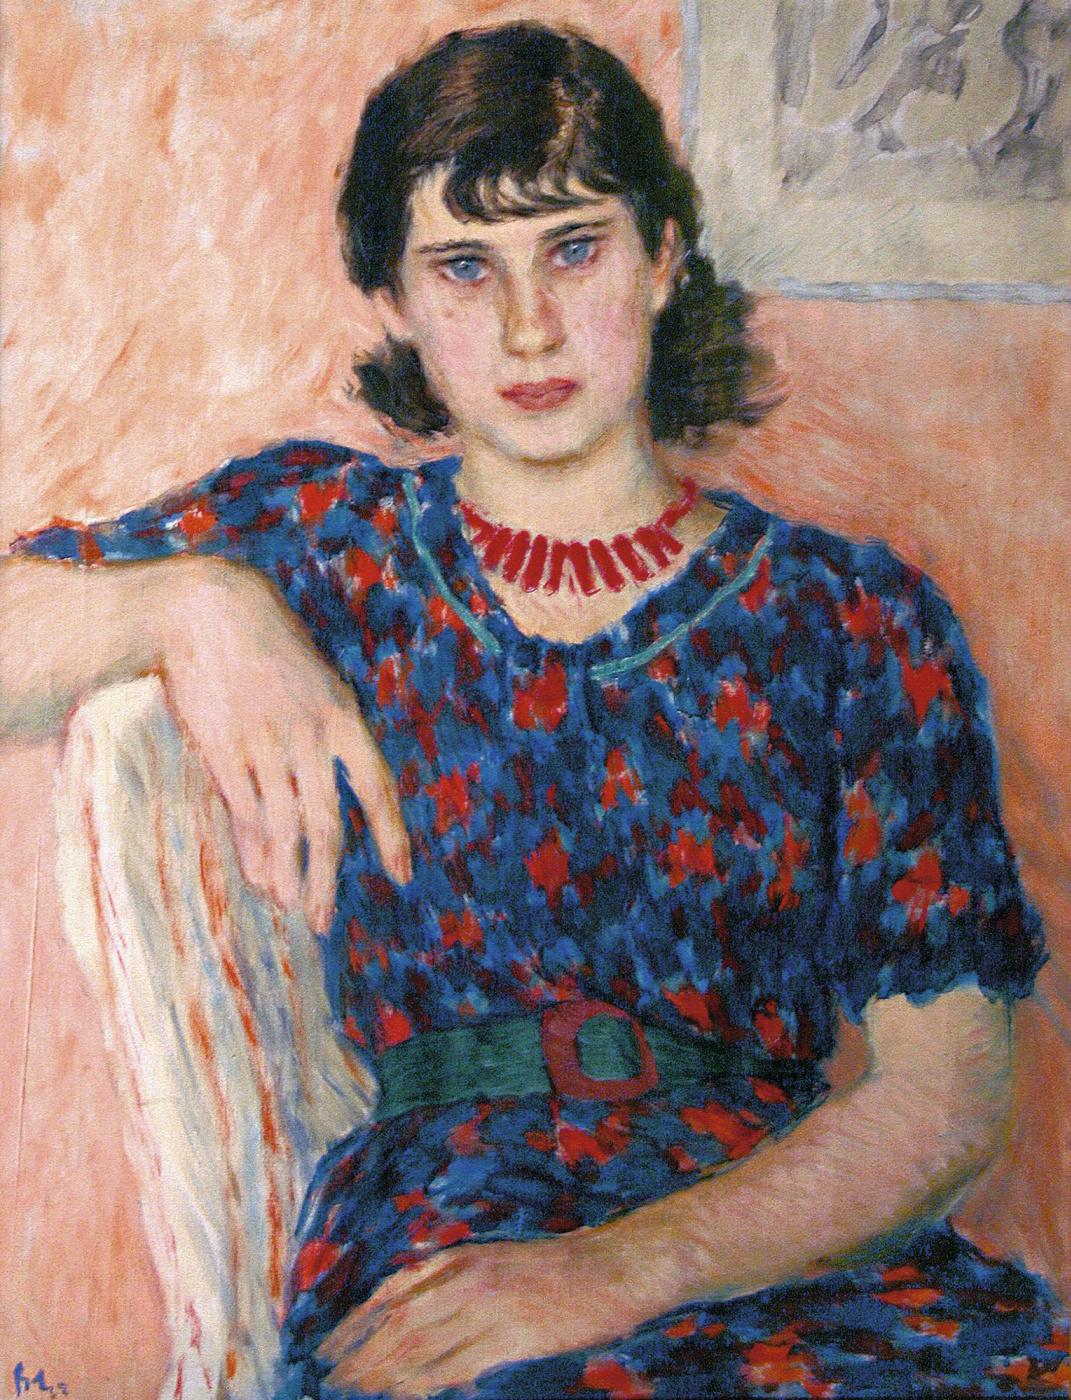 Vladimir Vasilyevich Lebedev. Portrait of a girl with bangs